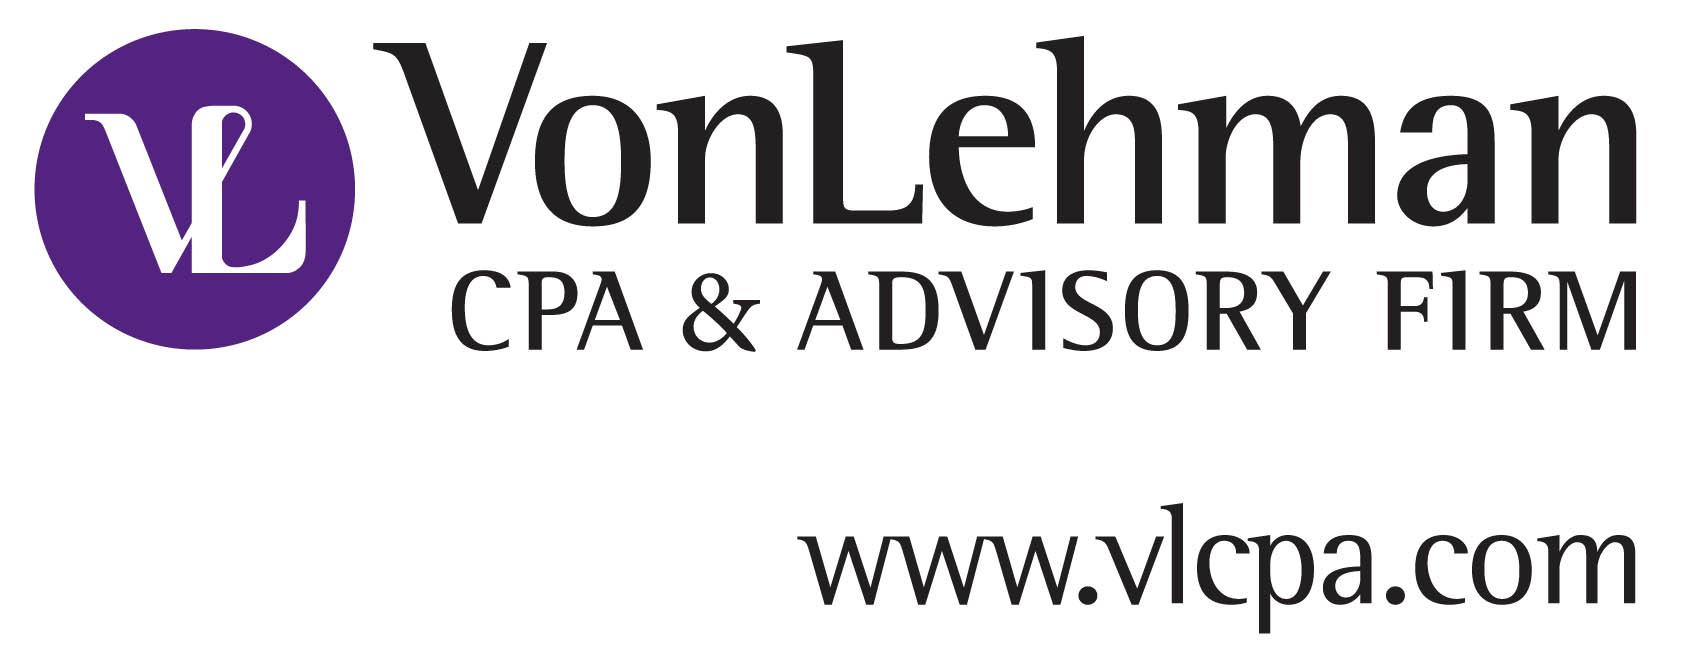 LOGO Web URL VonLehman_Web_RGB